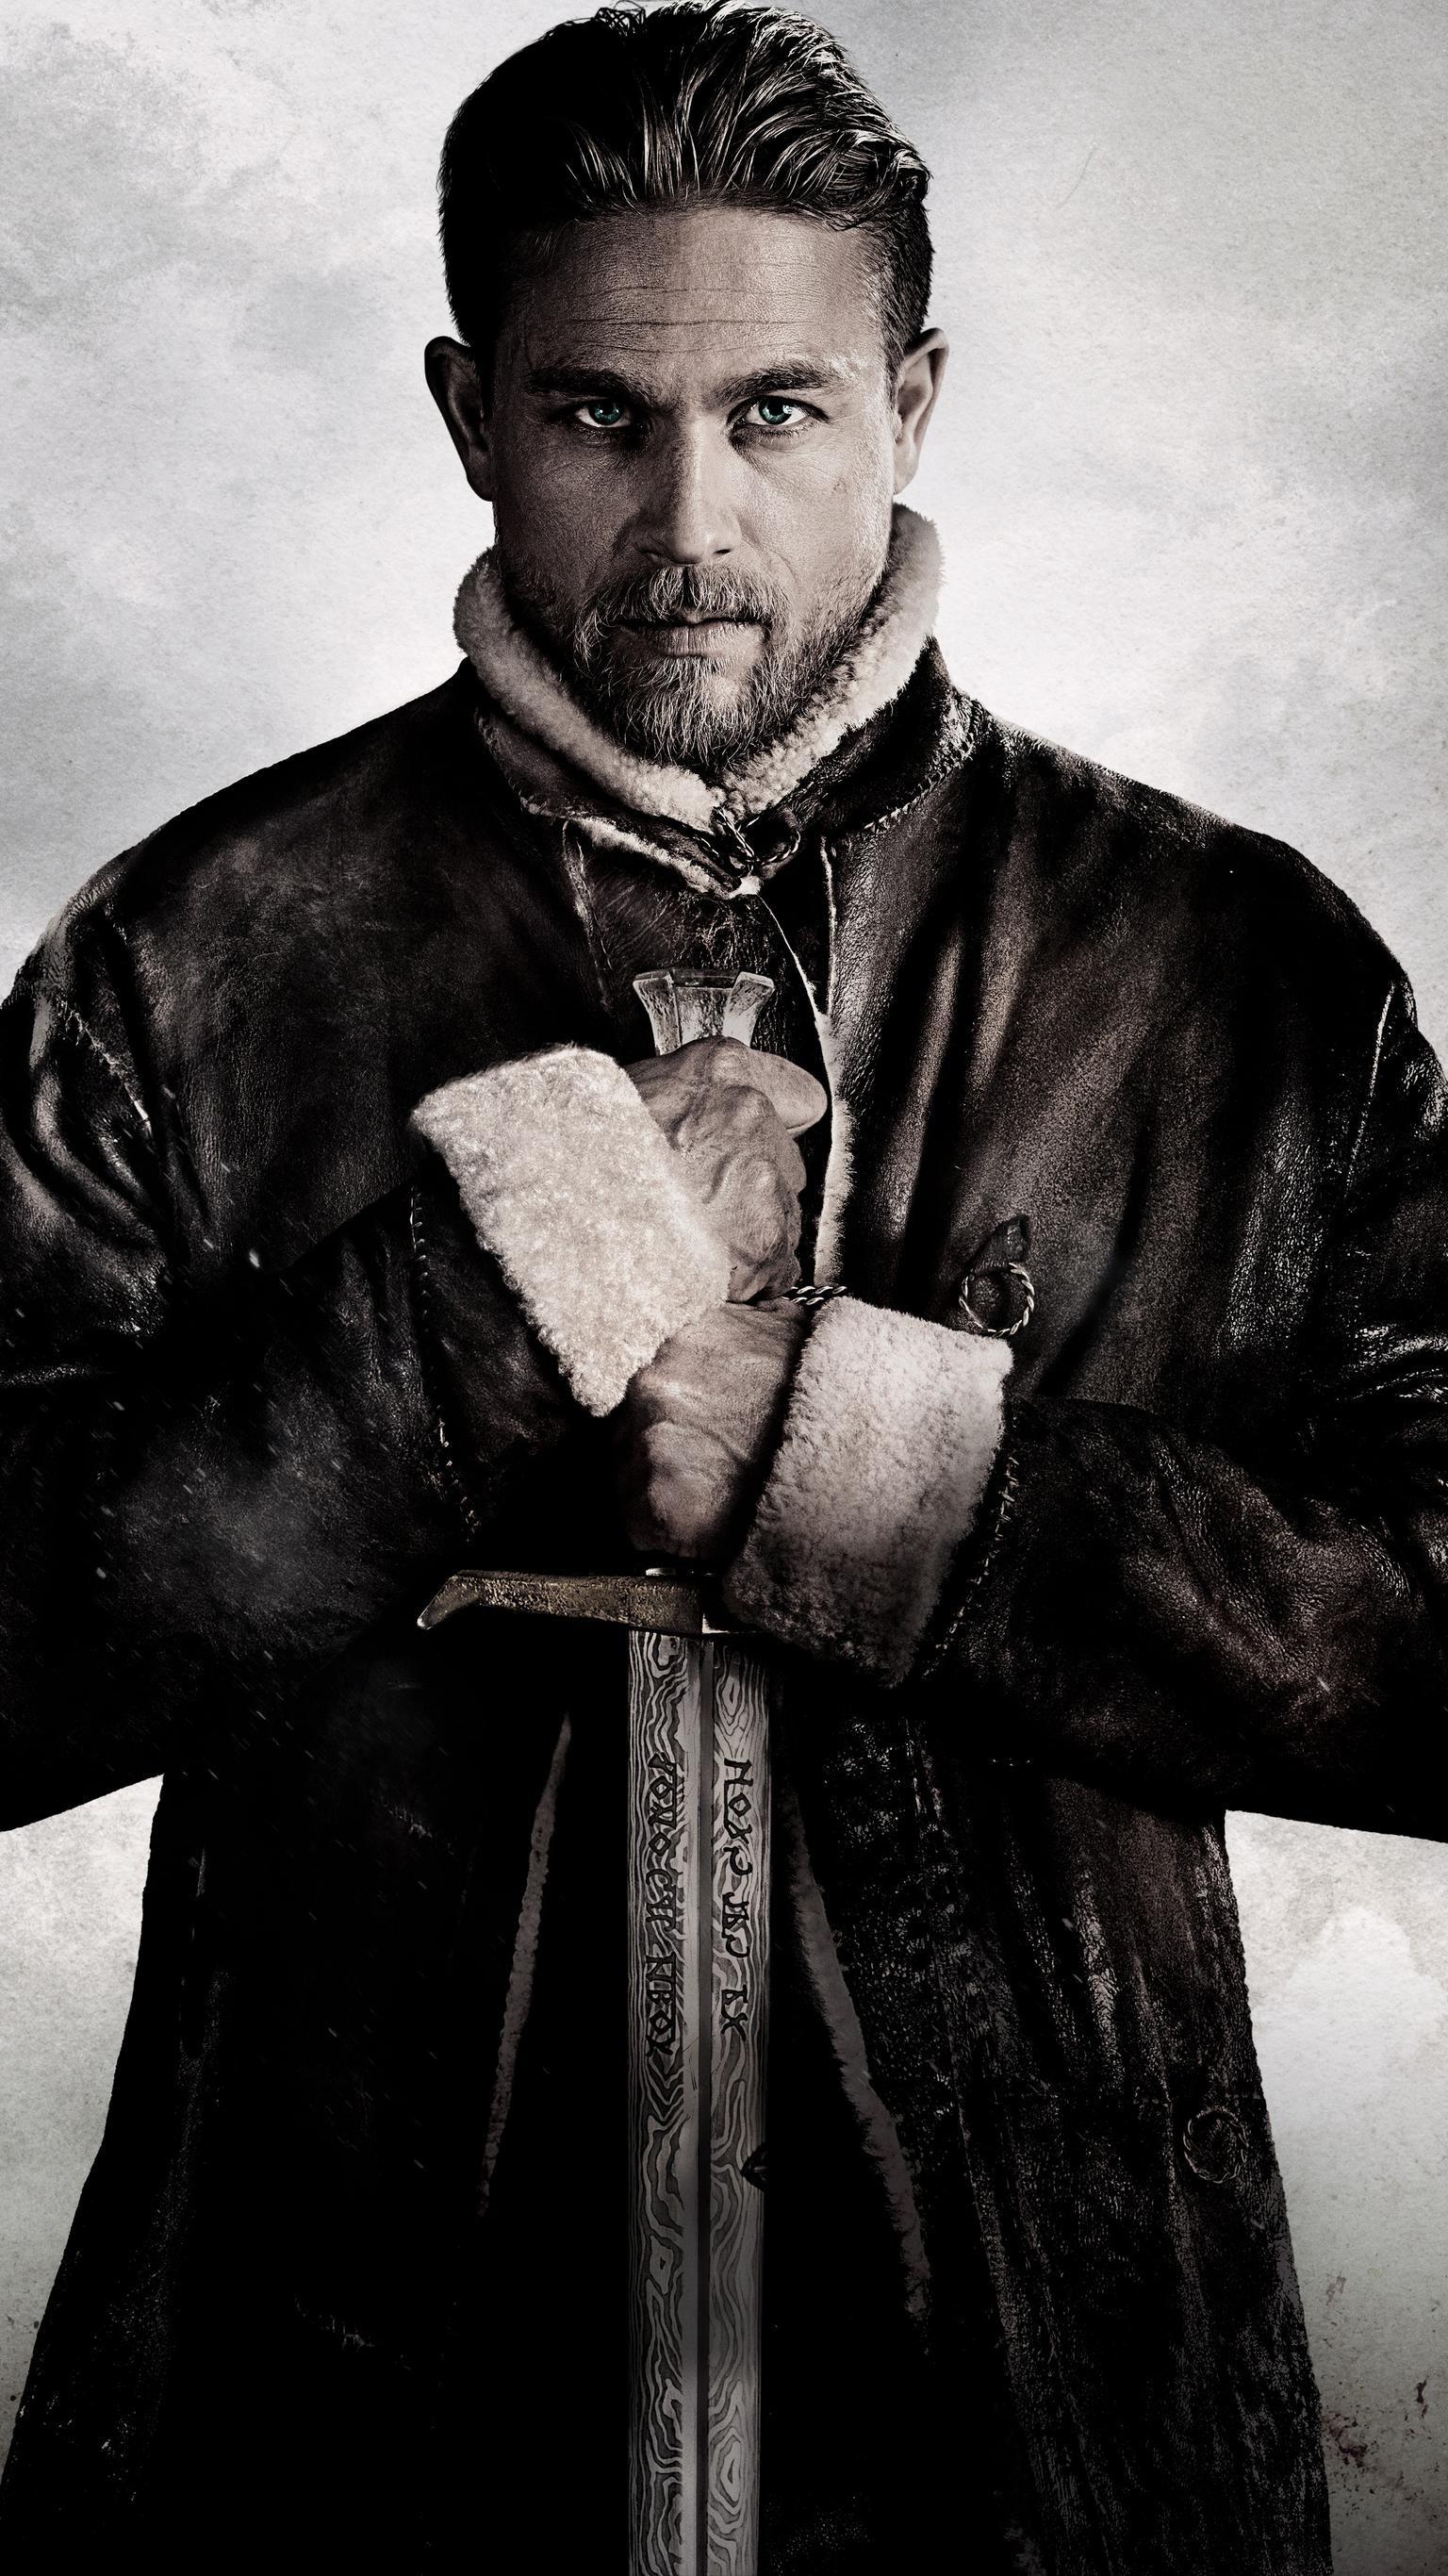 King Arthur Legend Of The Sword 2017 Phone Wallpaper Moviemania Charlie Hunnam King Arthur King Arthur Movie King Arthur Legend